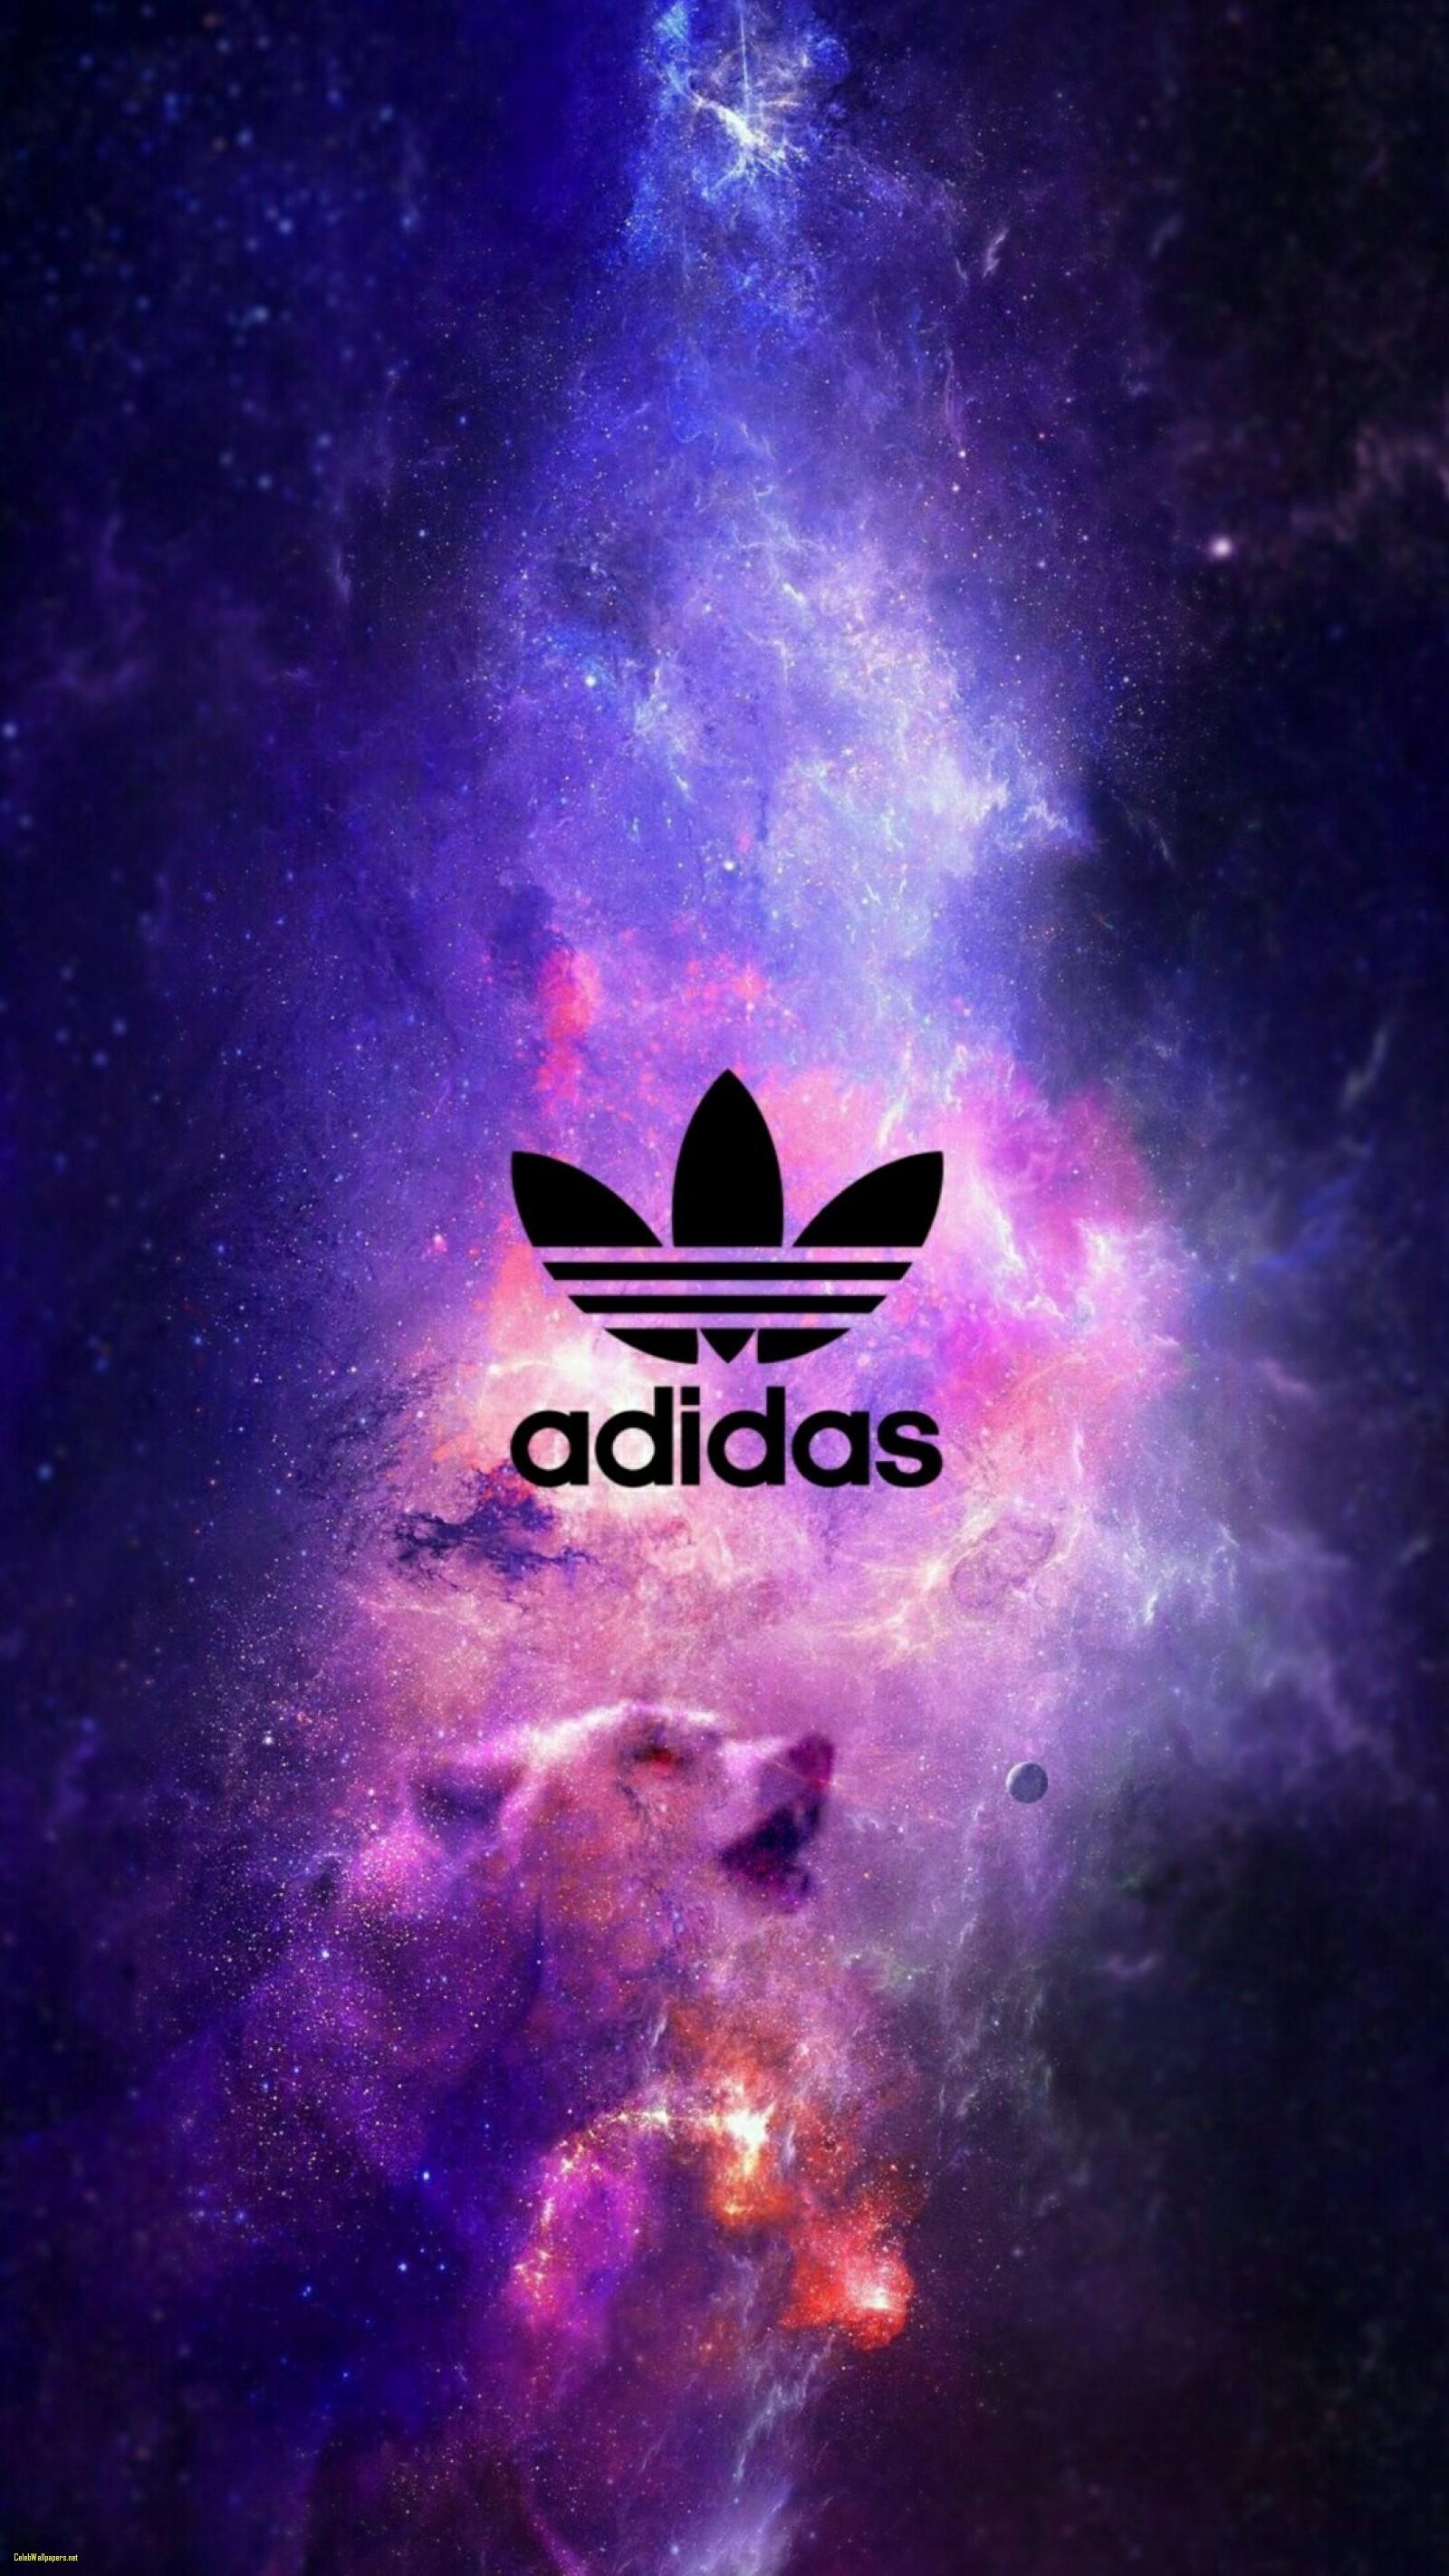 26 Adidas Ipad Wallpapers On Wallpapersafari